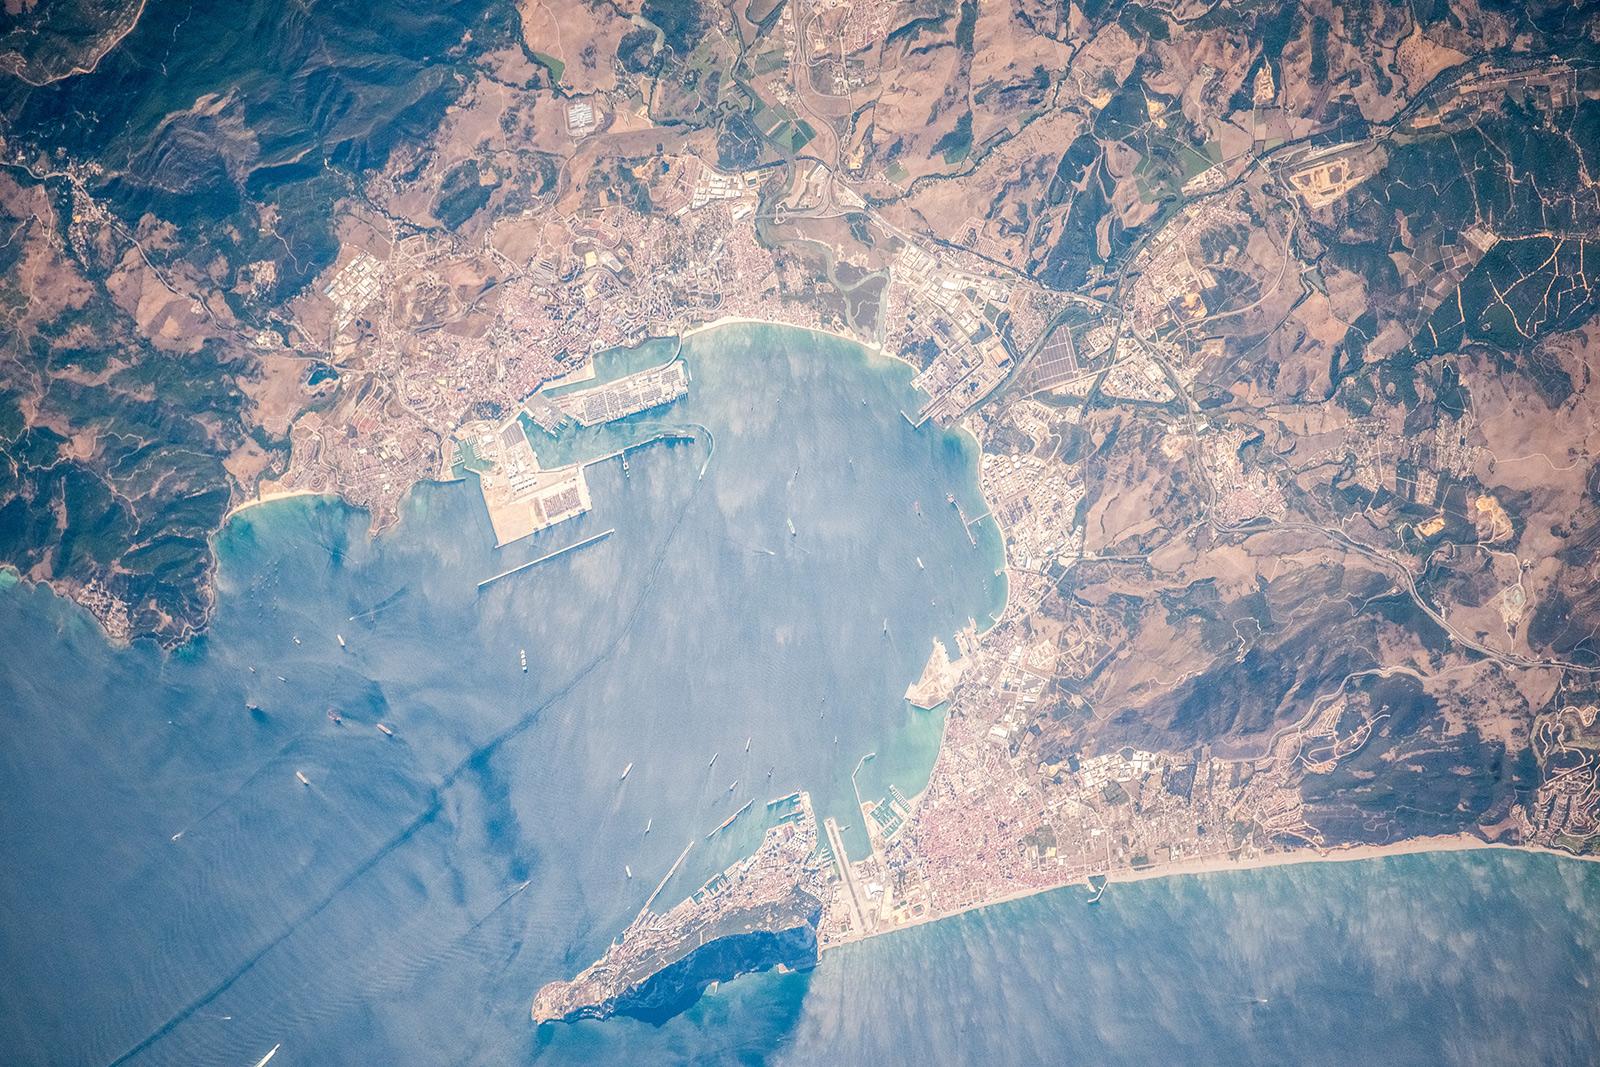 Strait of Gibraltar & Bay of Gibraltar (Bay of Algeciras)